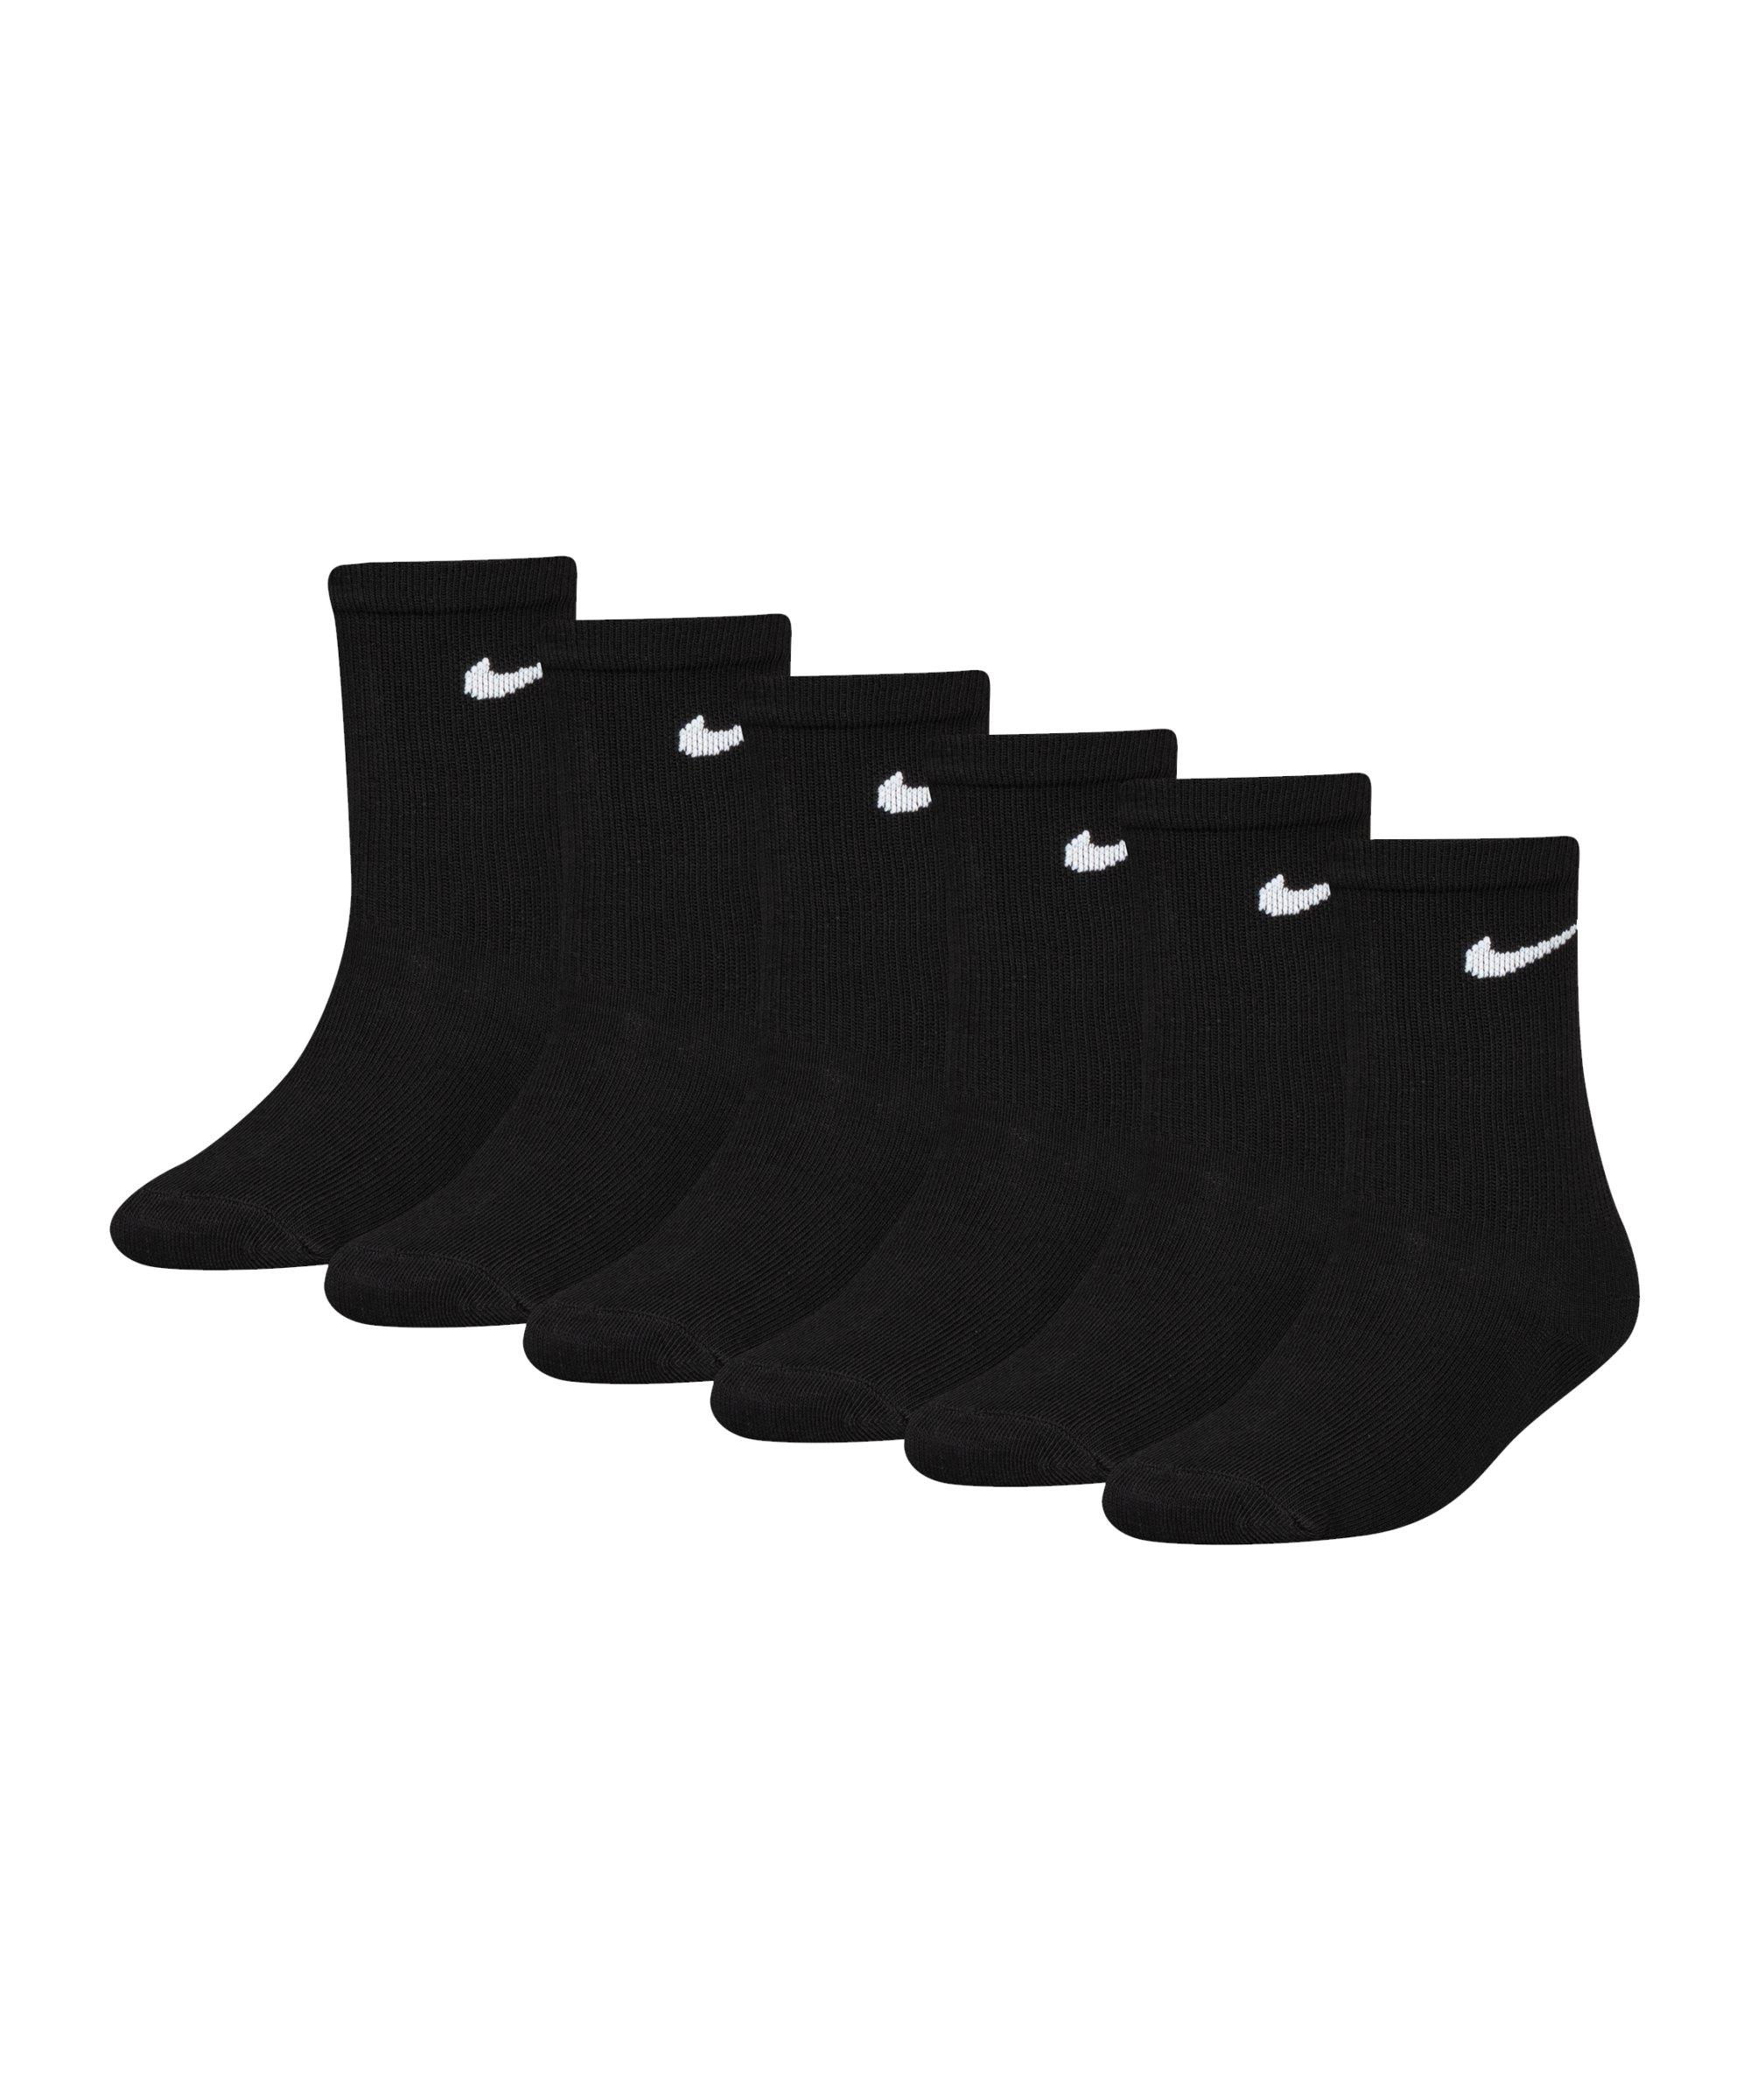 Nike Colorful Crew 6er Pack Socken Kids 4-7 F023 - schwarz